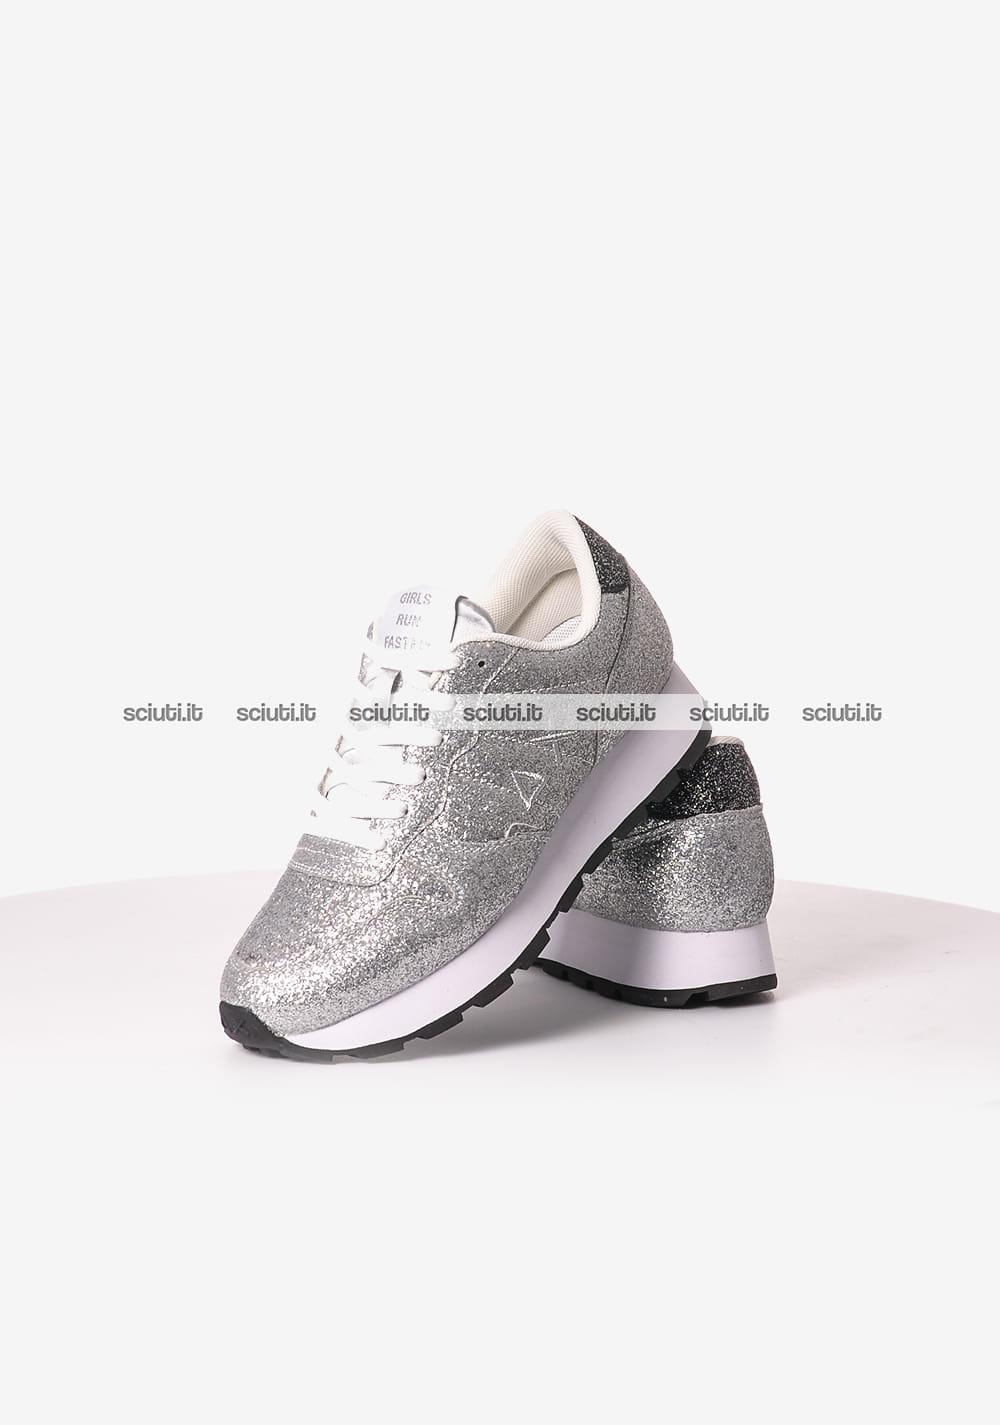 Scarpe SUN68 donna running thin glitter argento | Sciuti.it